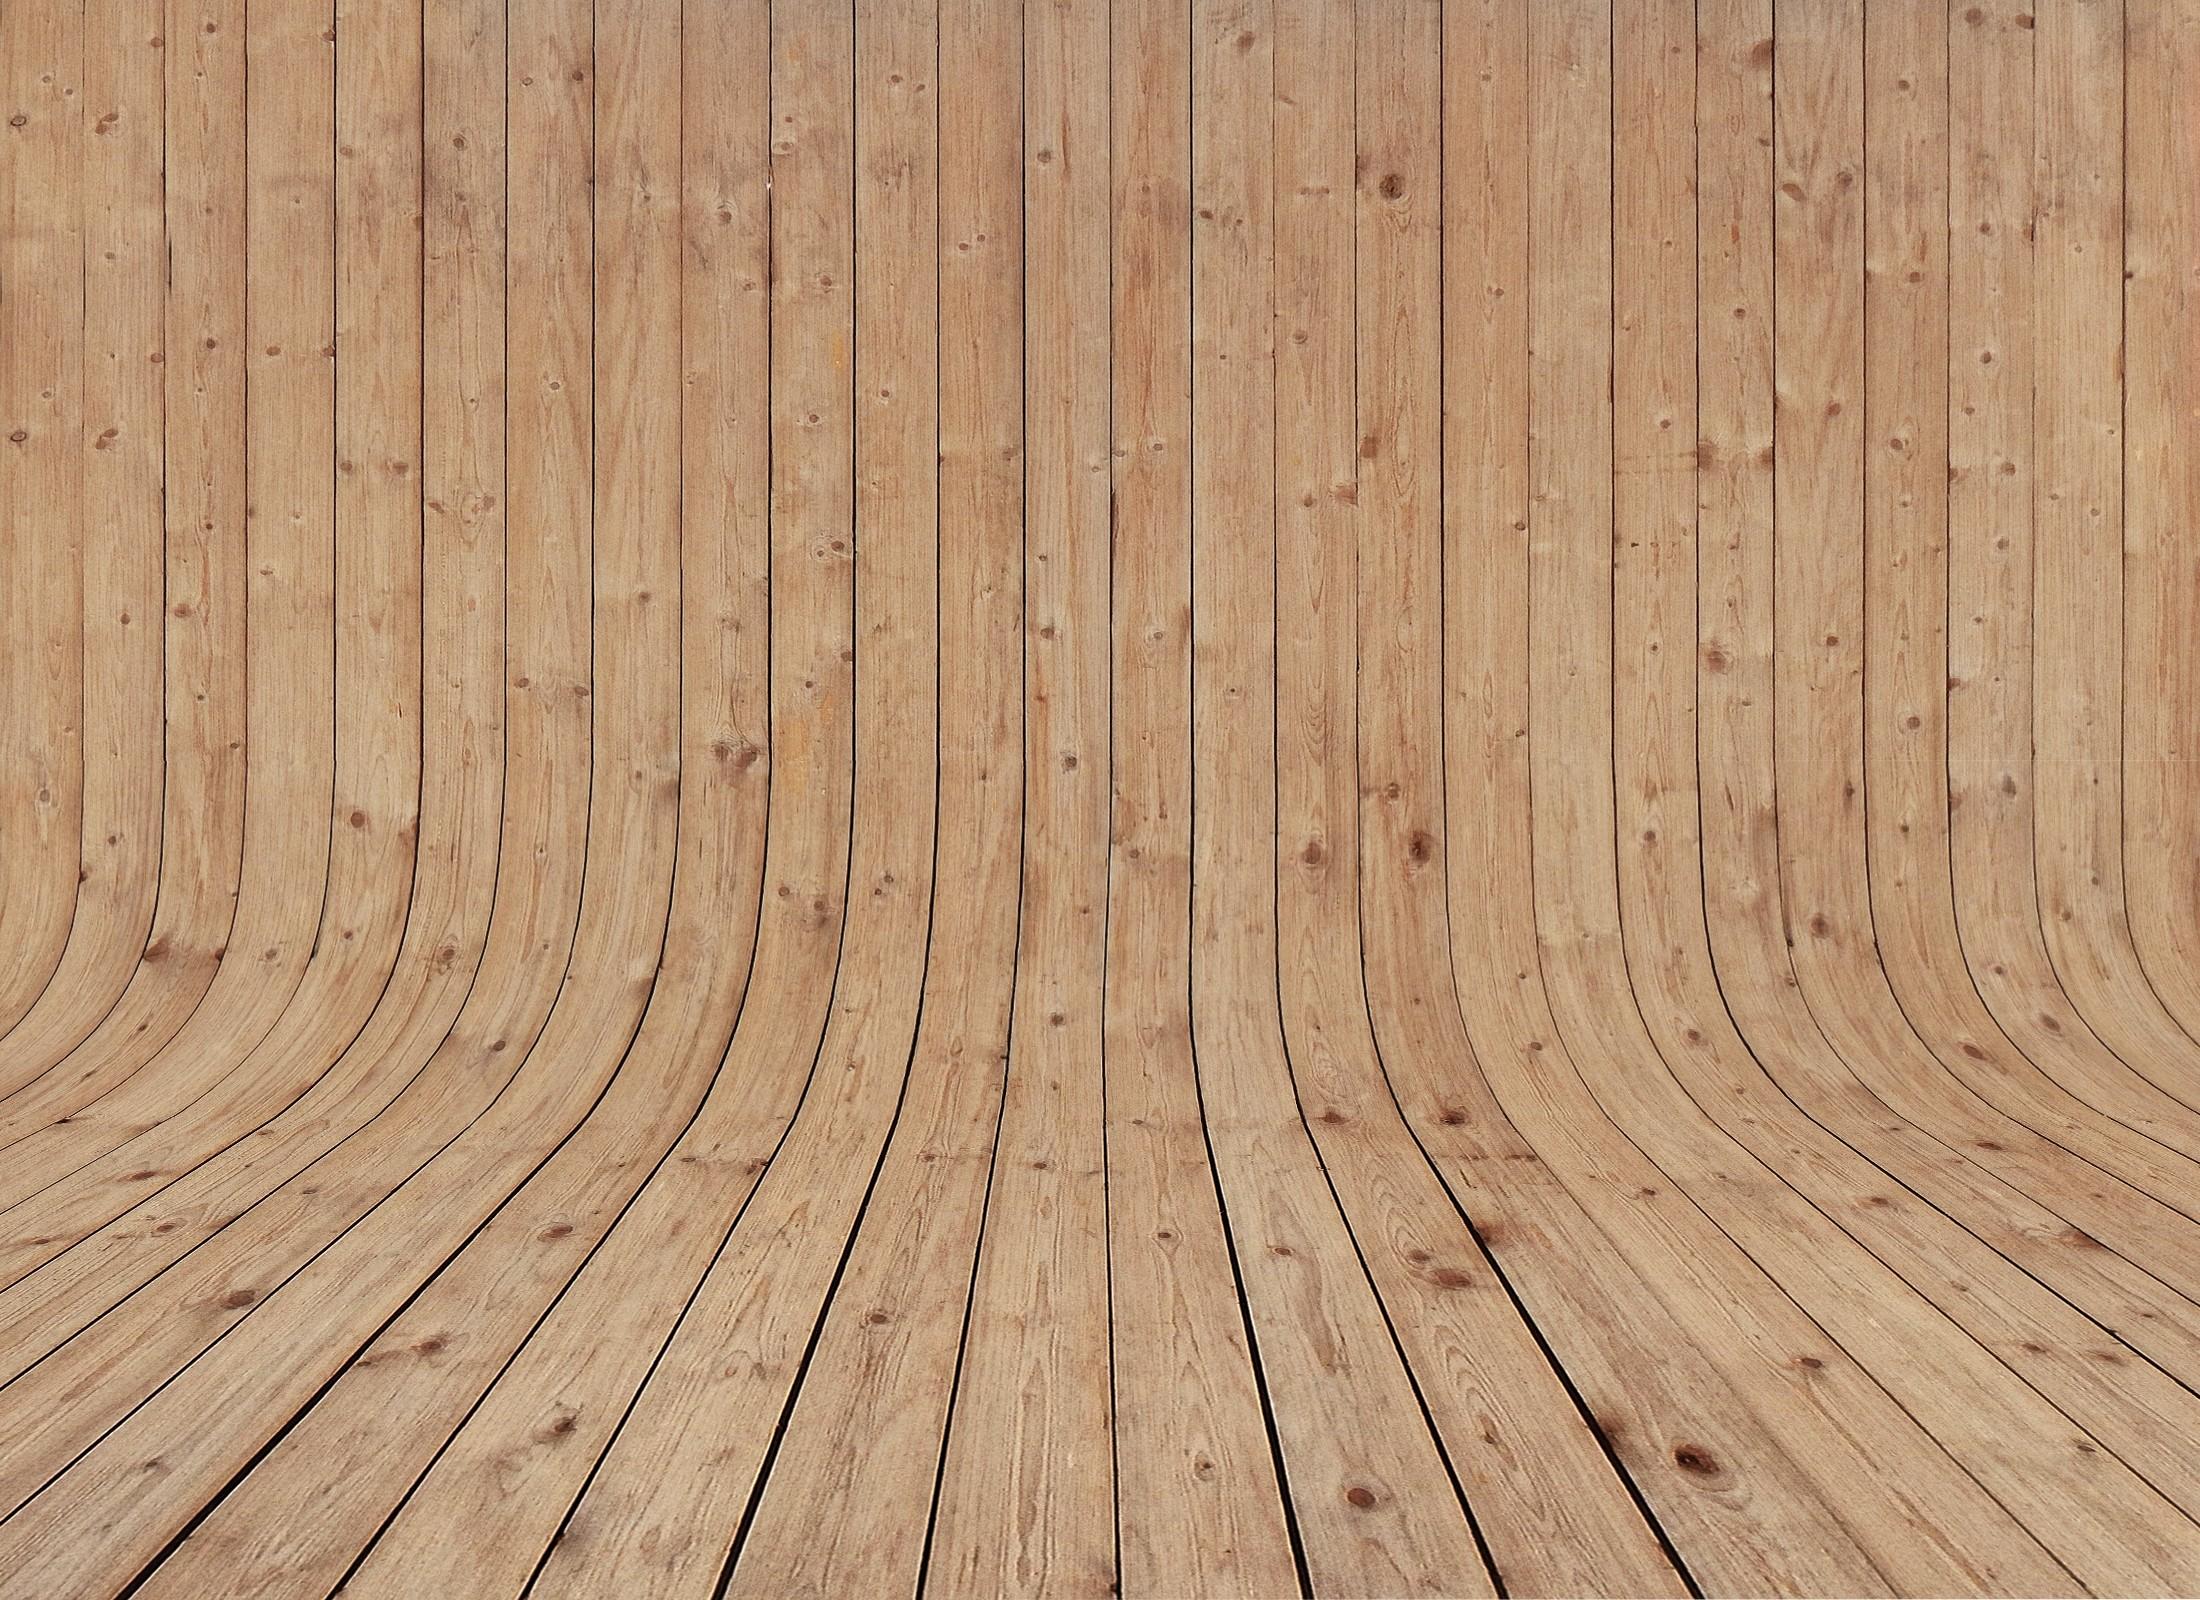 hintergrundbilder : holzoberfläche, feld, nahansicht, textur